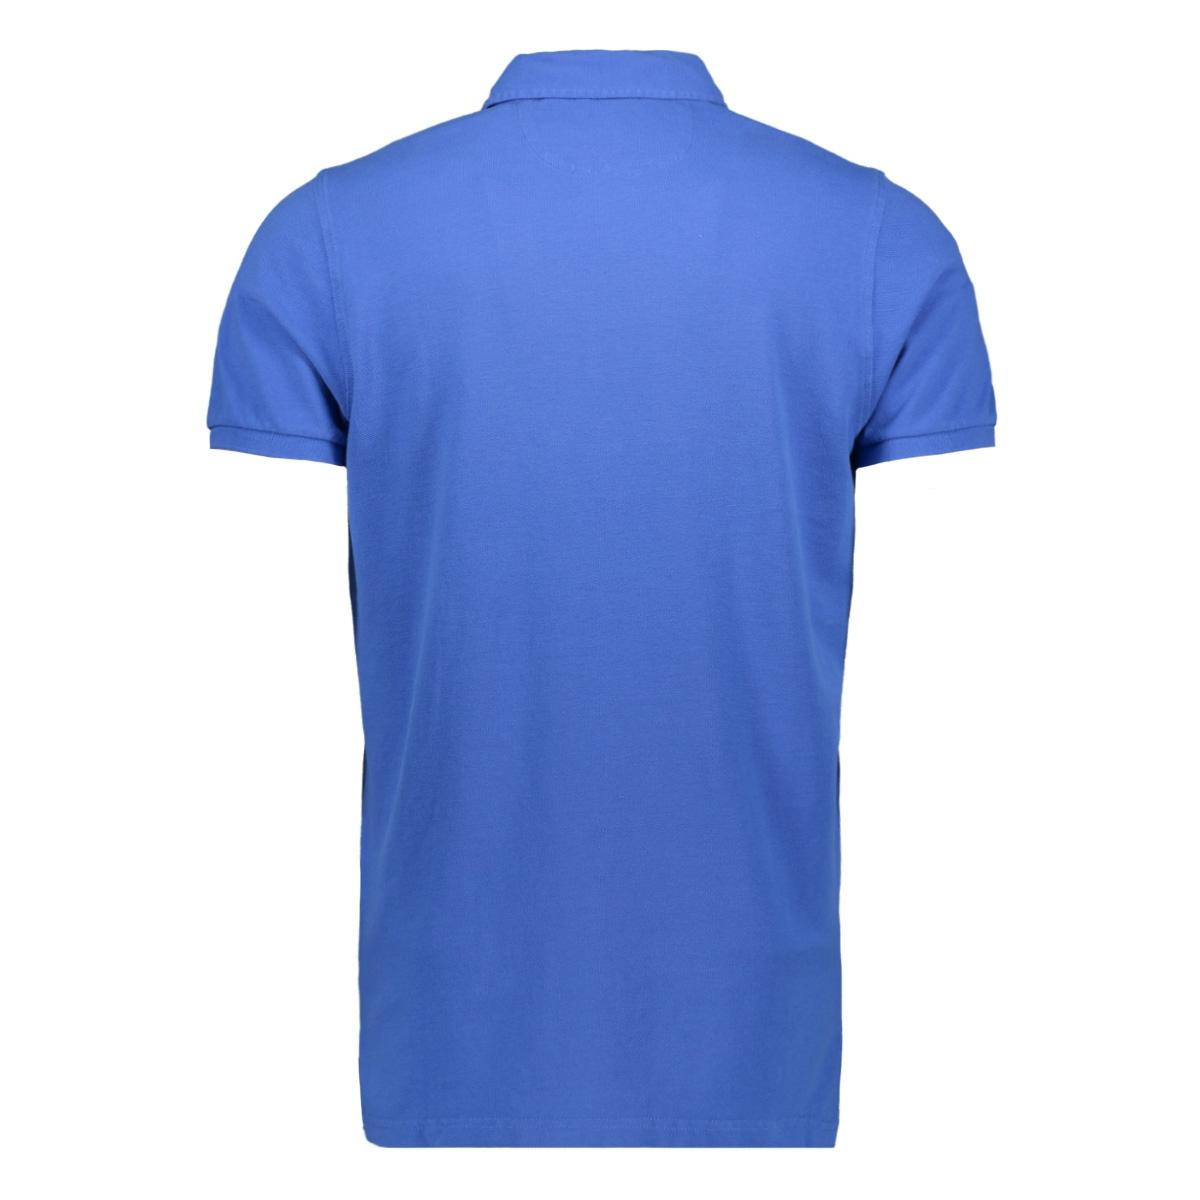 waiapu 20cn150 n.z.a. polo 260 new blue